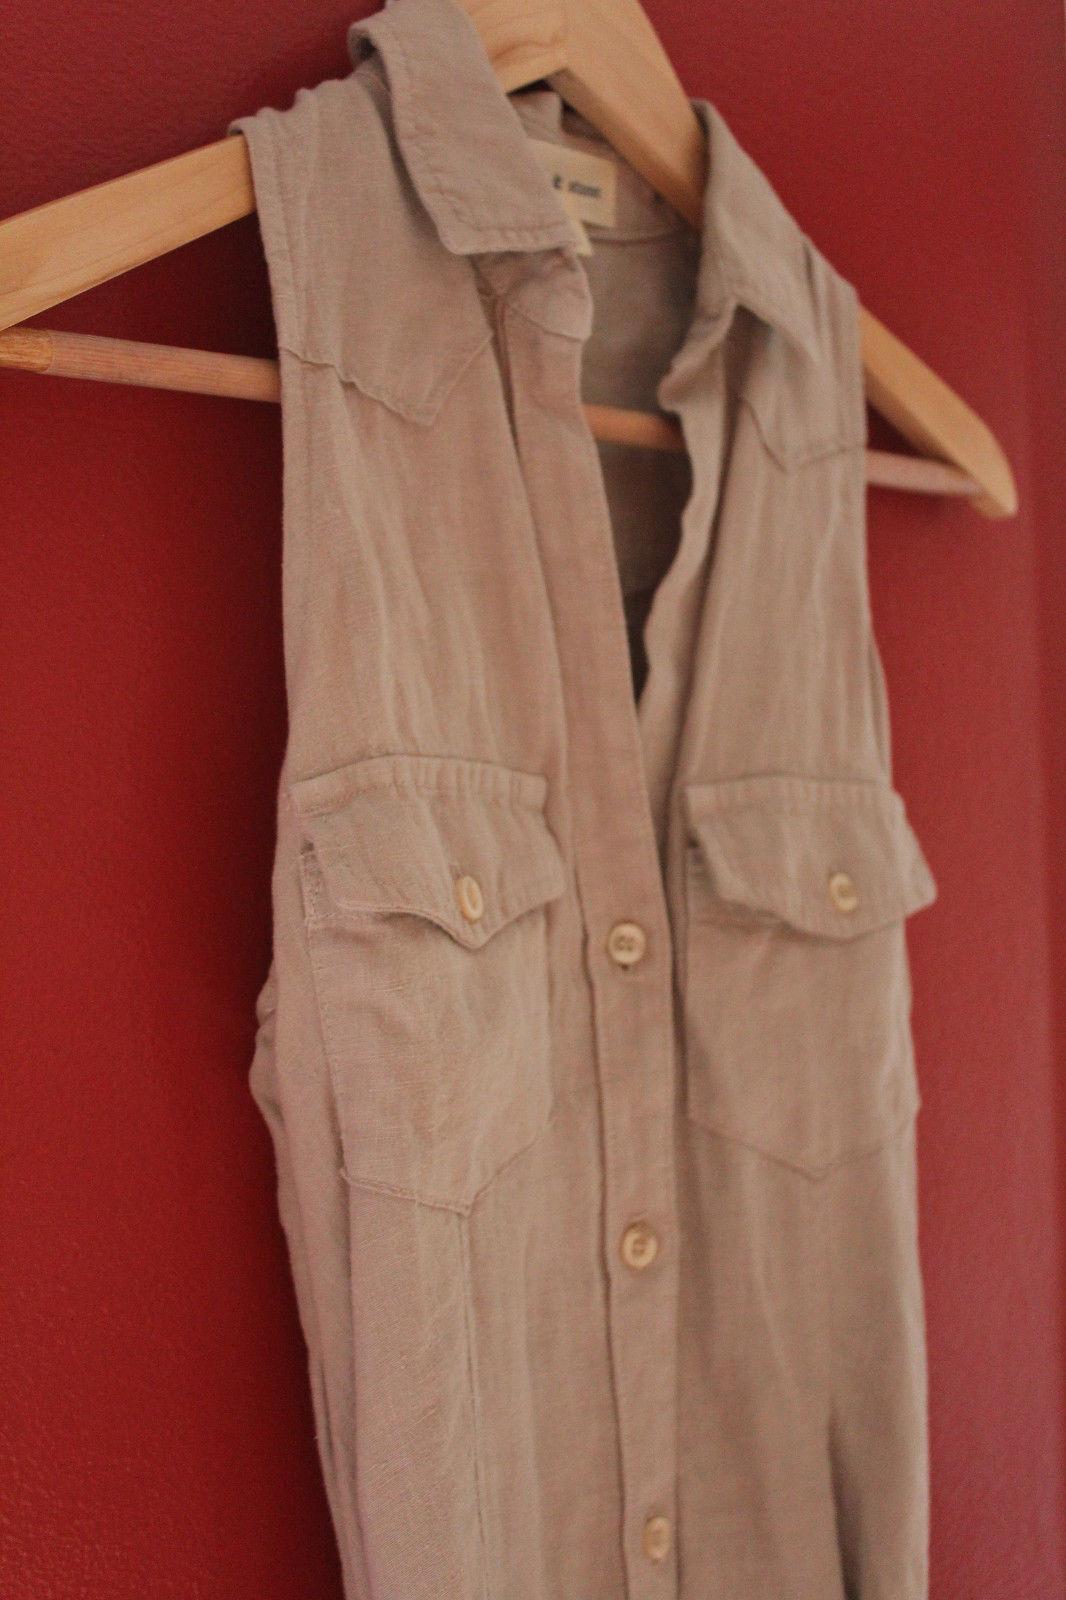 NEW! Cloth & Stone Soft Linen Knit Beige Button Down Tunic Top Dress XS $180